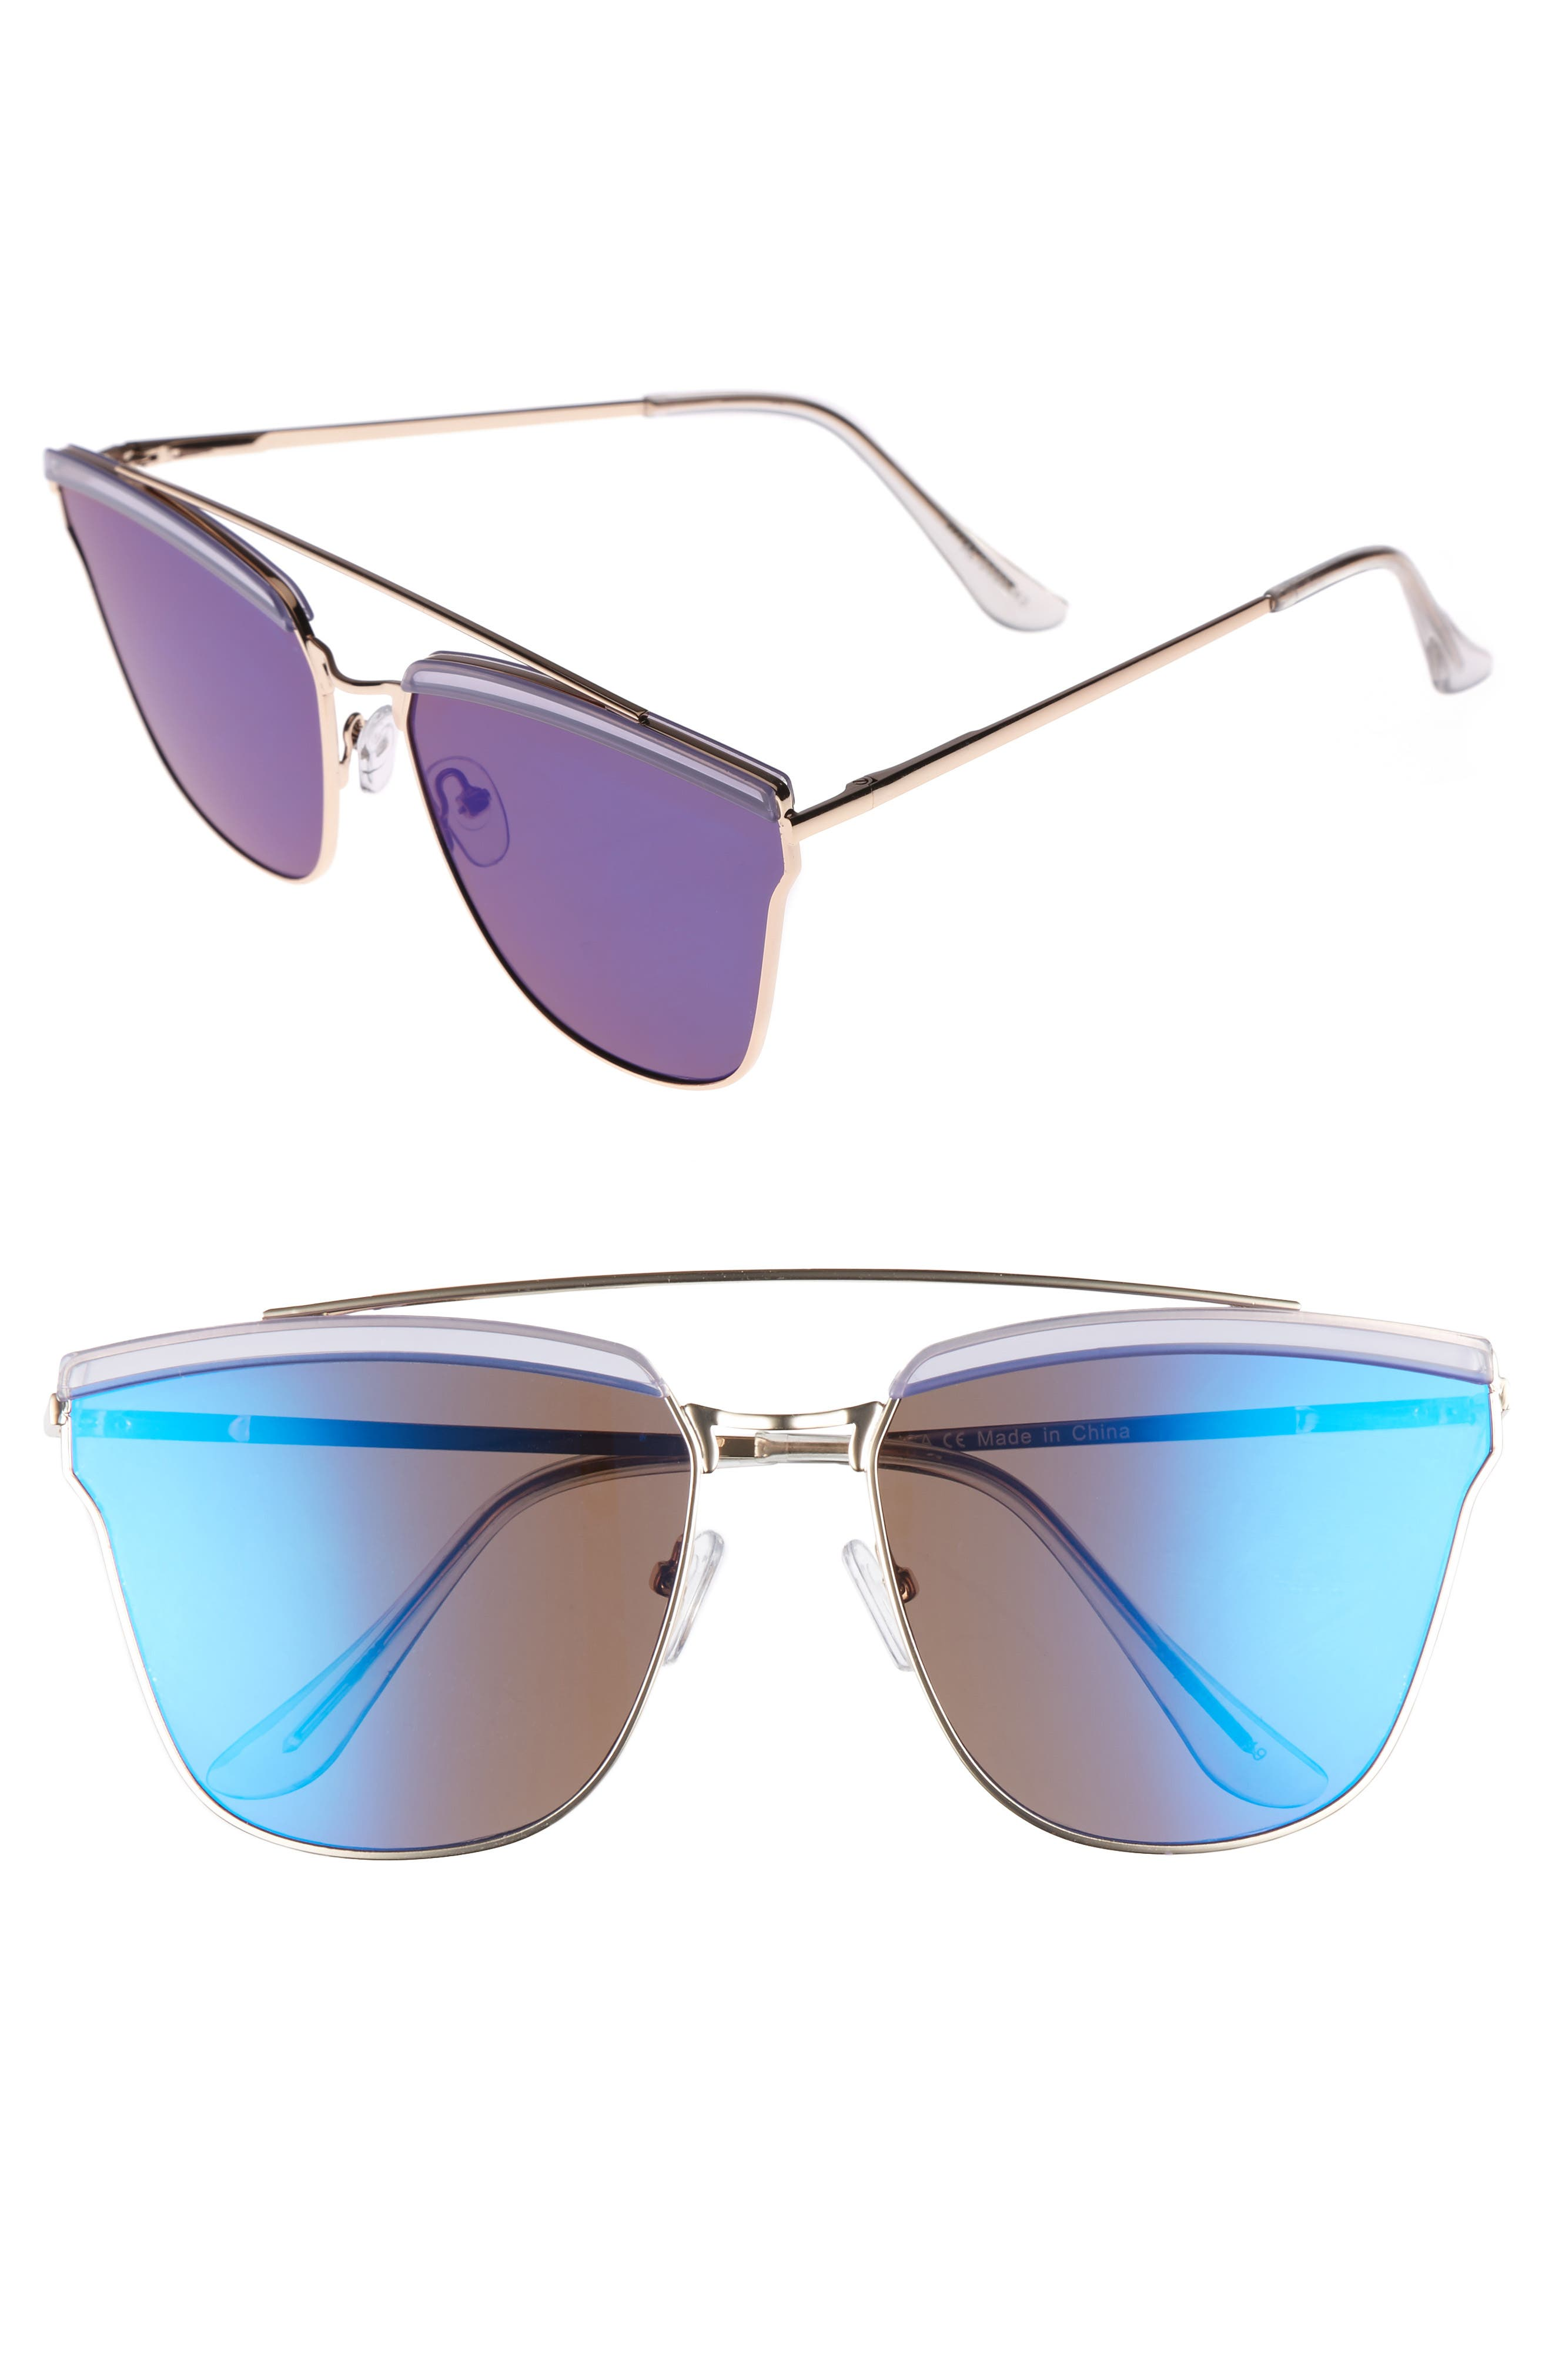 60mm Mirror Sunglasses,                             Main thumbnail 1, color,                             712